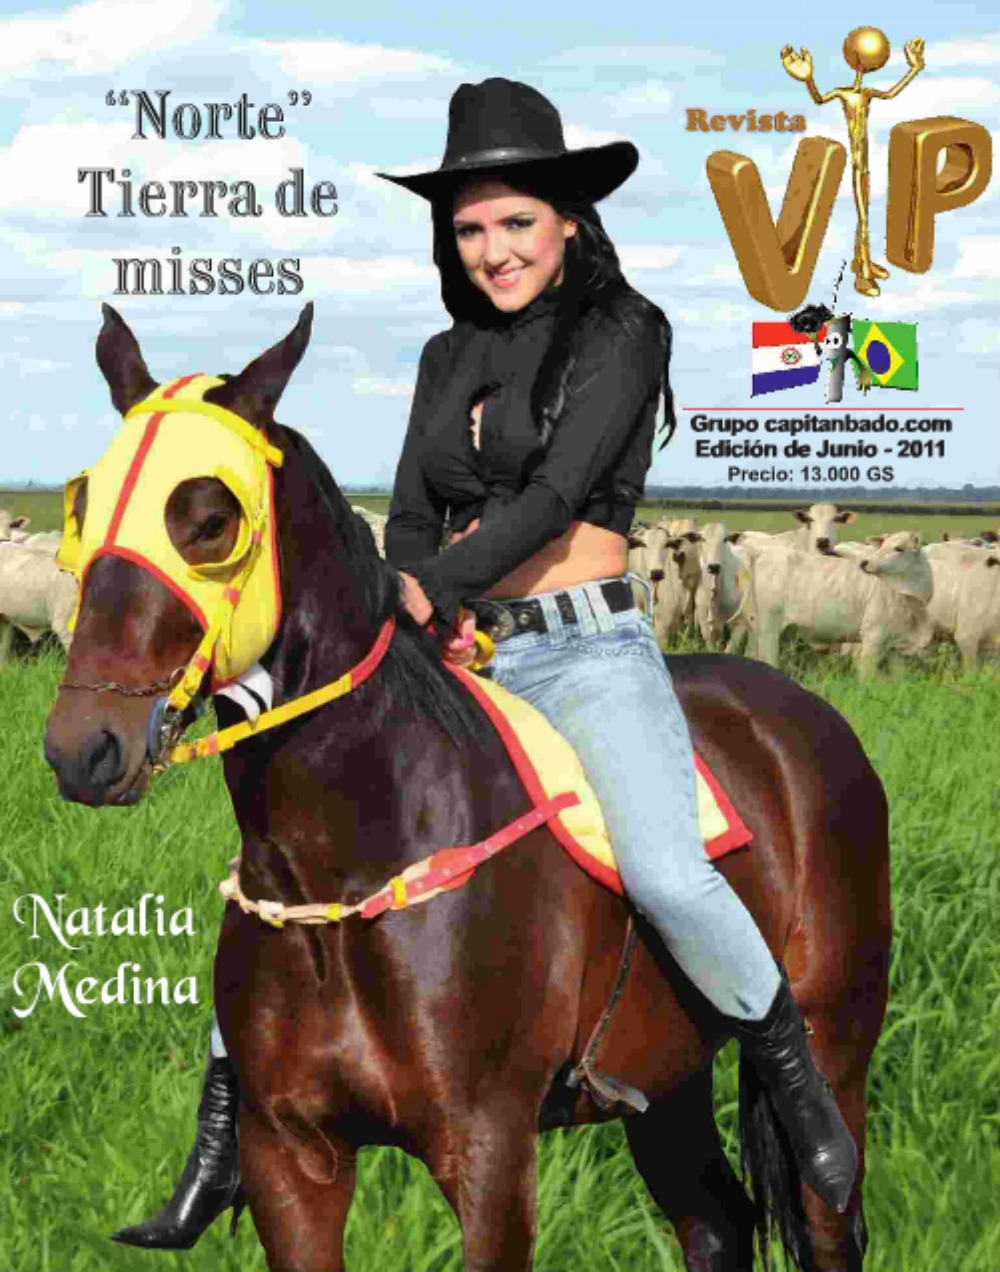 Vip 3 Paraguay